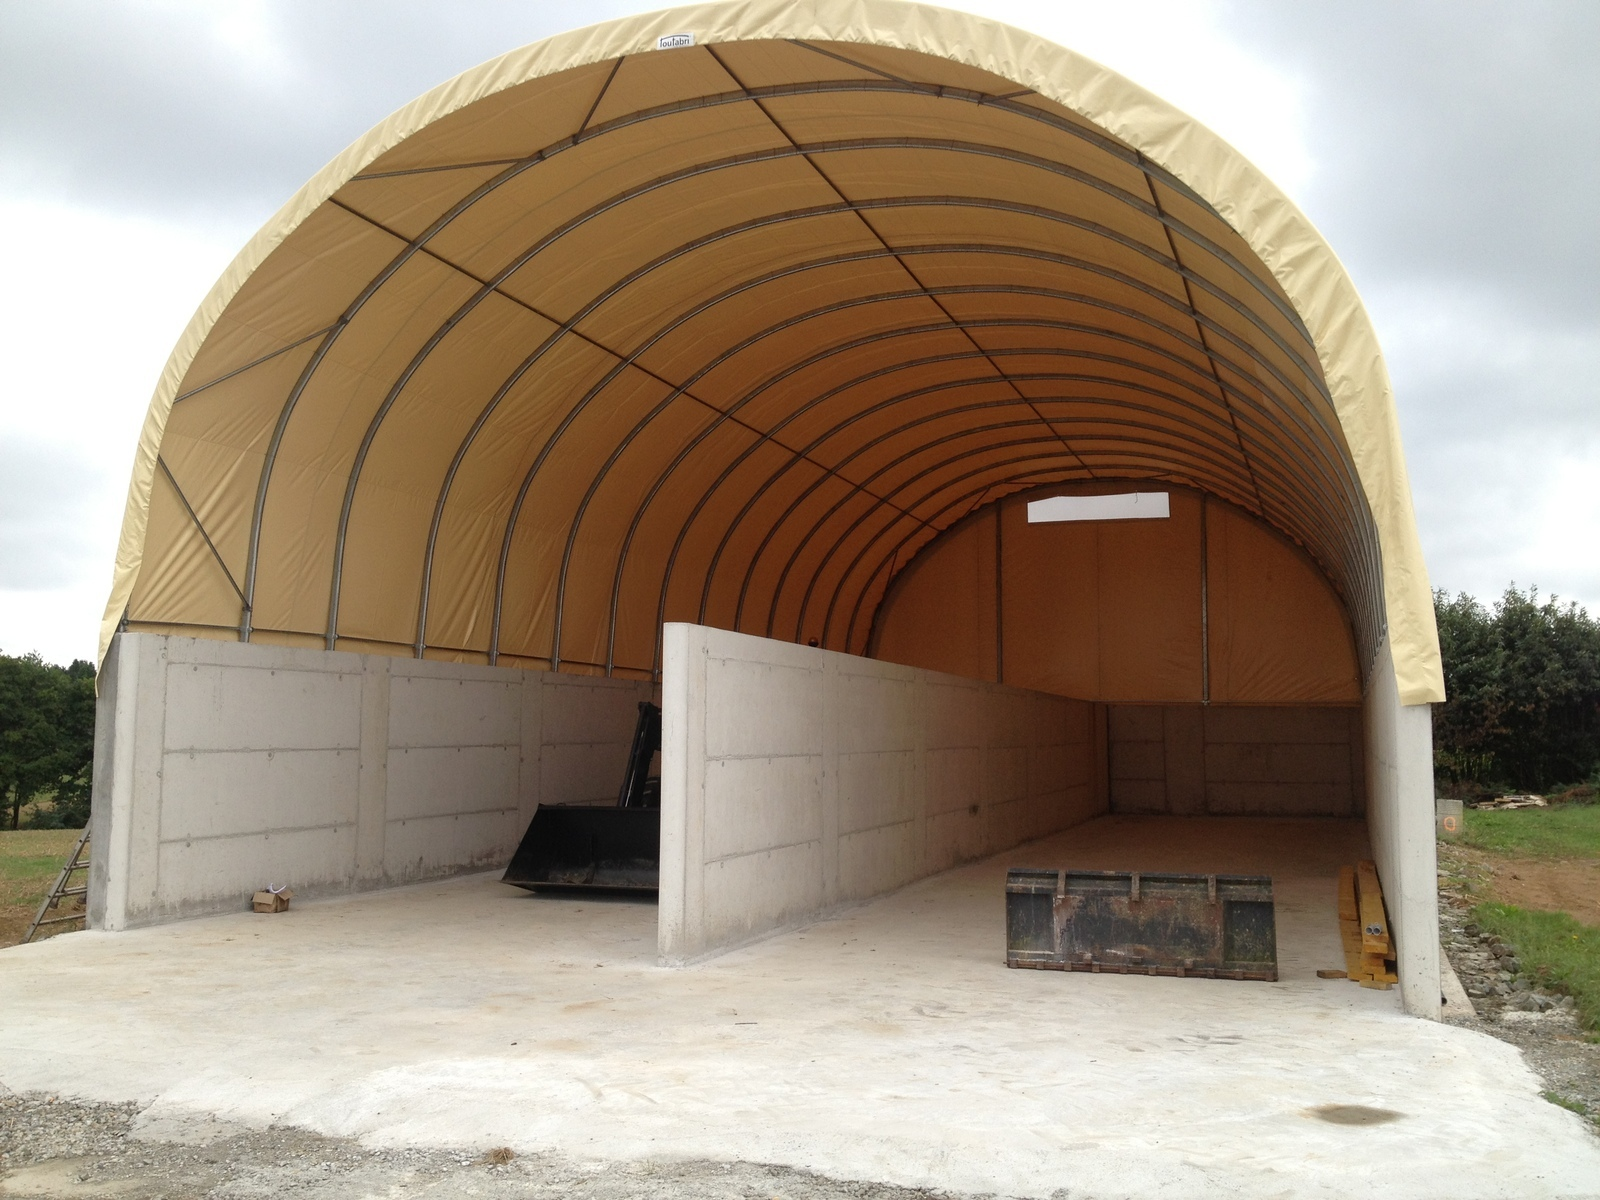 Stockage c r ales bretagne tunnel agricole bm n gociations for Abri de stockage agricole